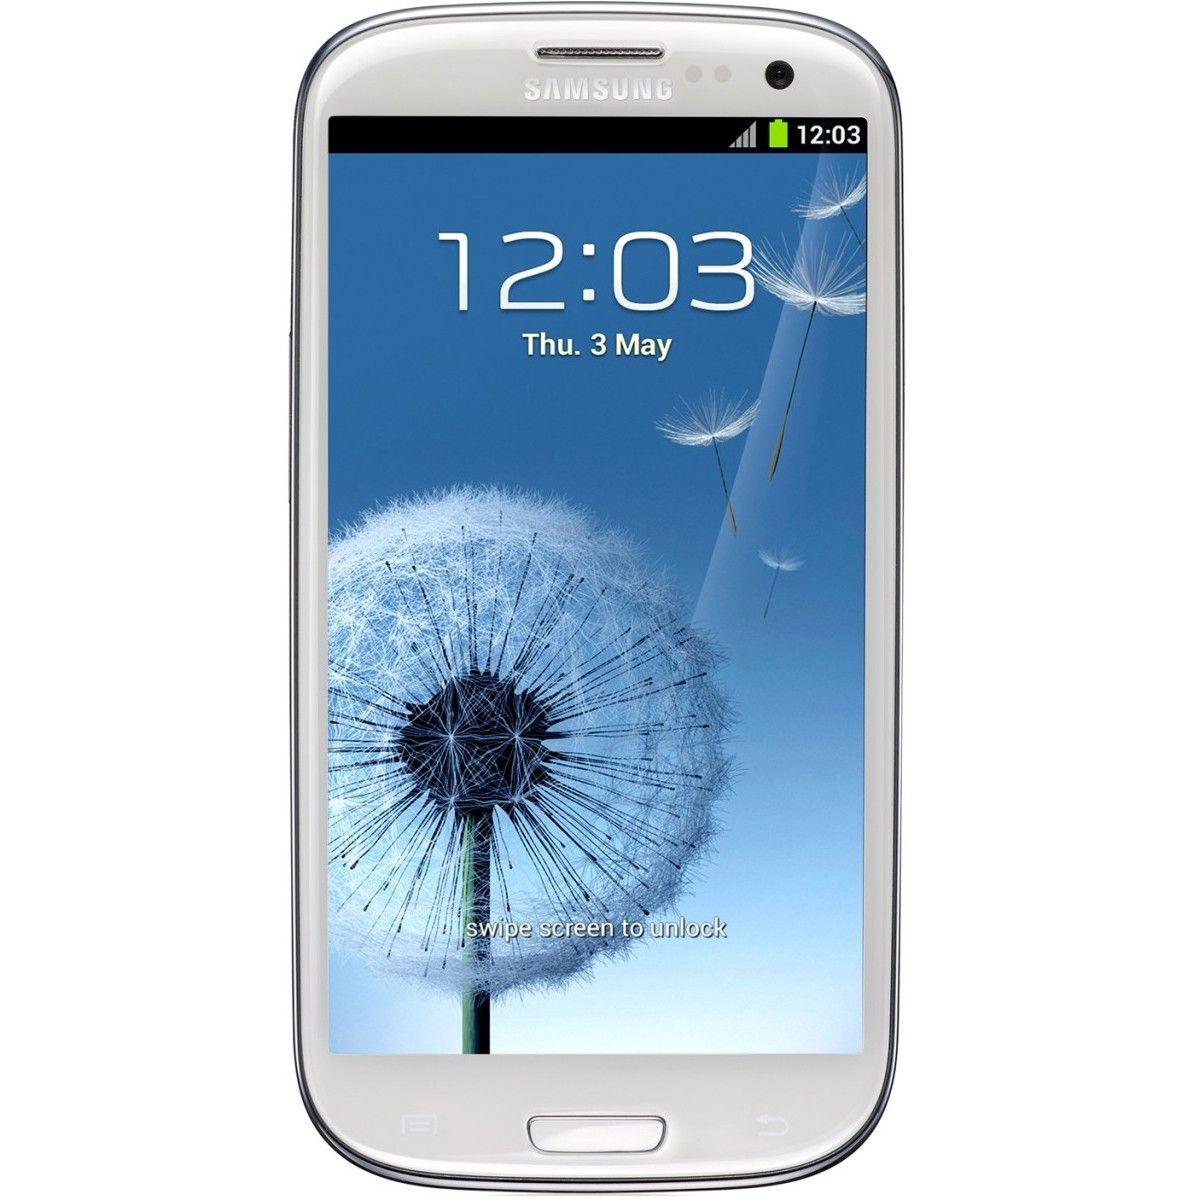 Samsung Galaxy S3 Neo Duos